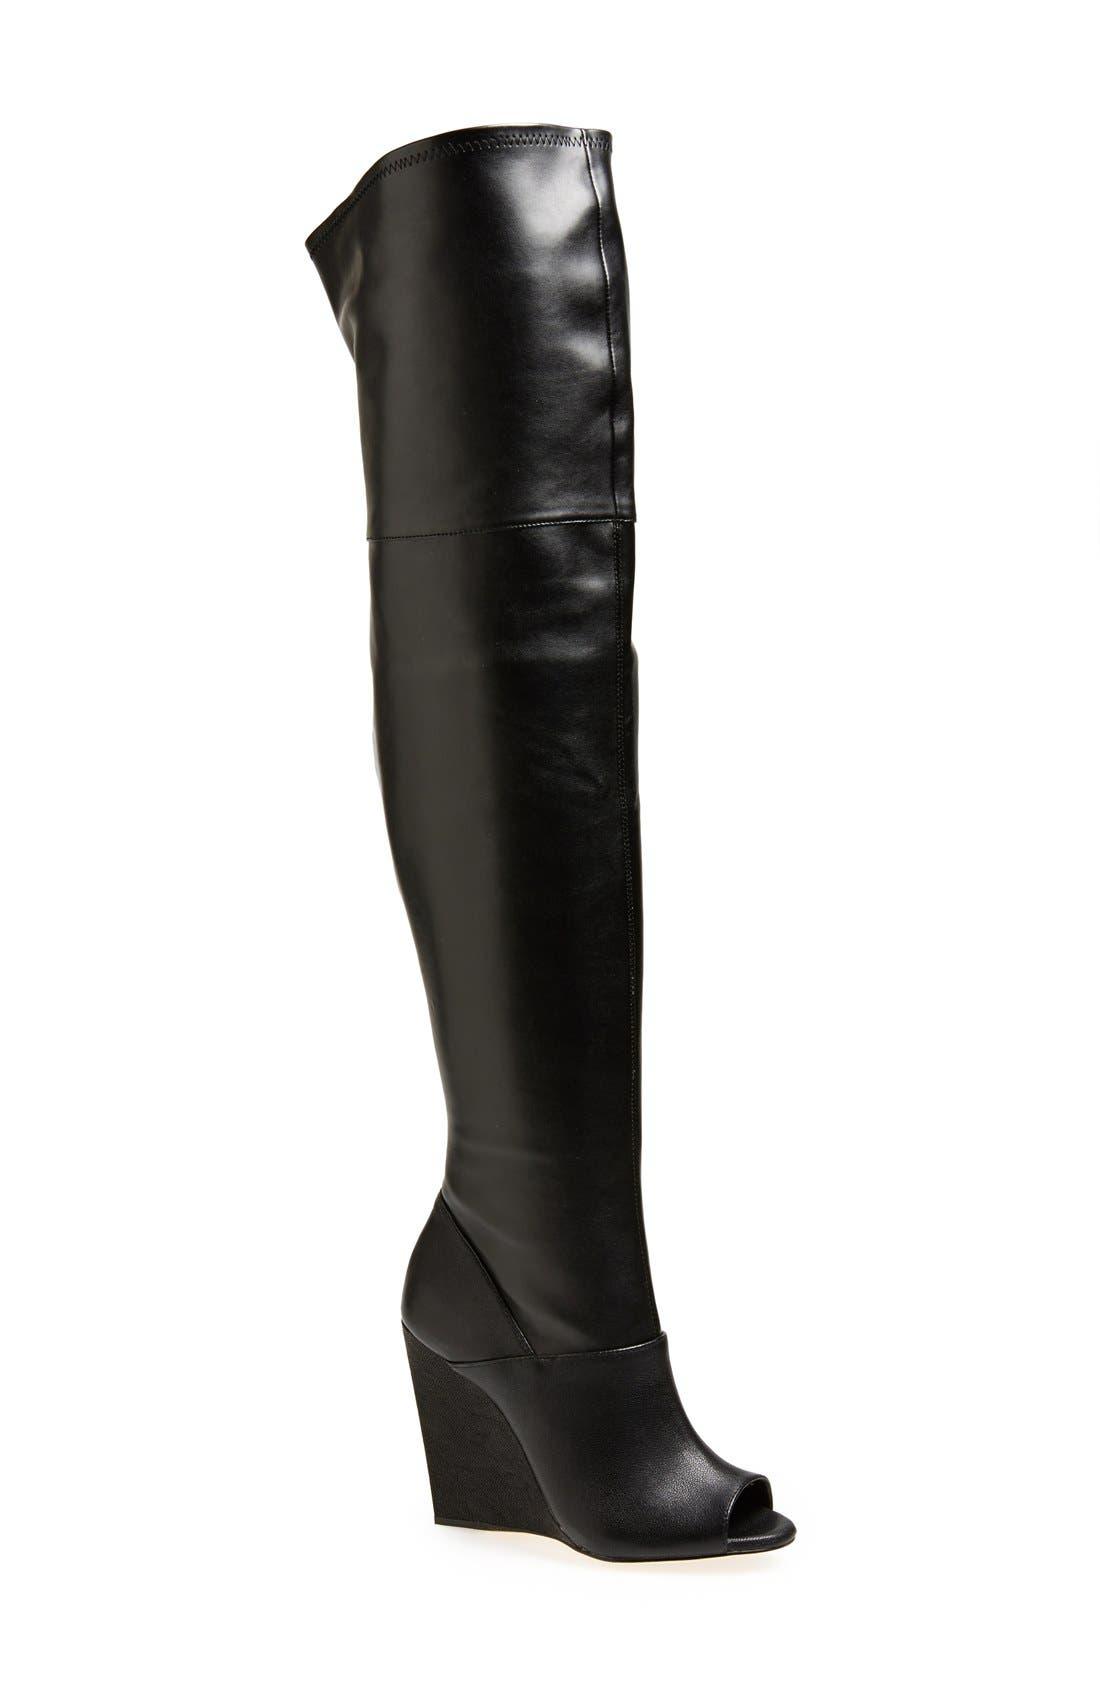 BCBGMAXAZRIA,                             'Deanna' Over the Knee Leather Peep Toe Boot,                             Main thumbnail 1, color,                             001